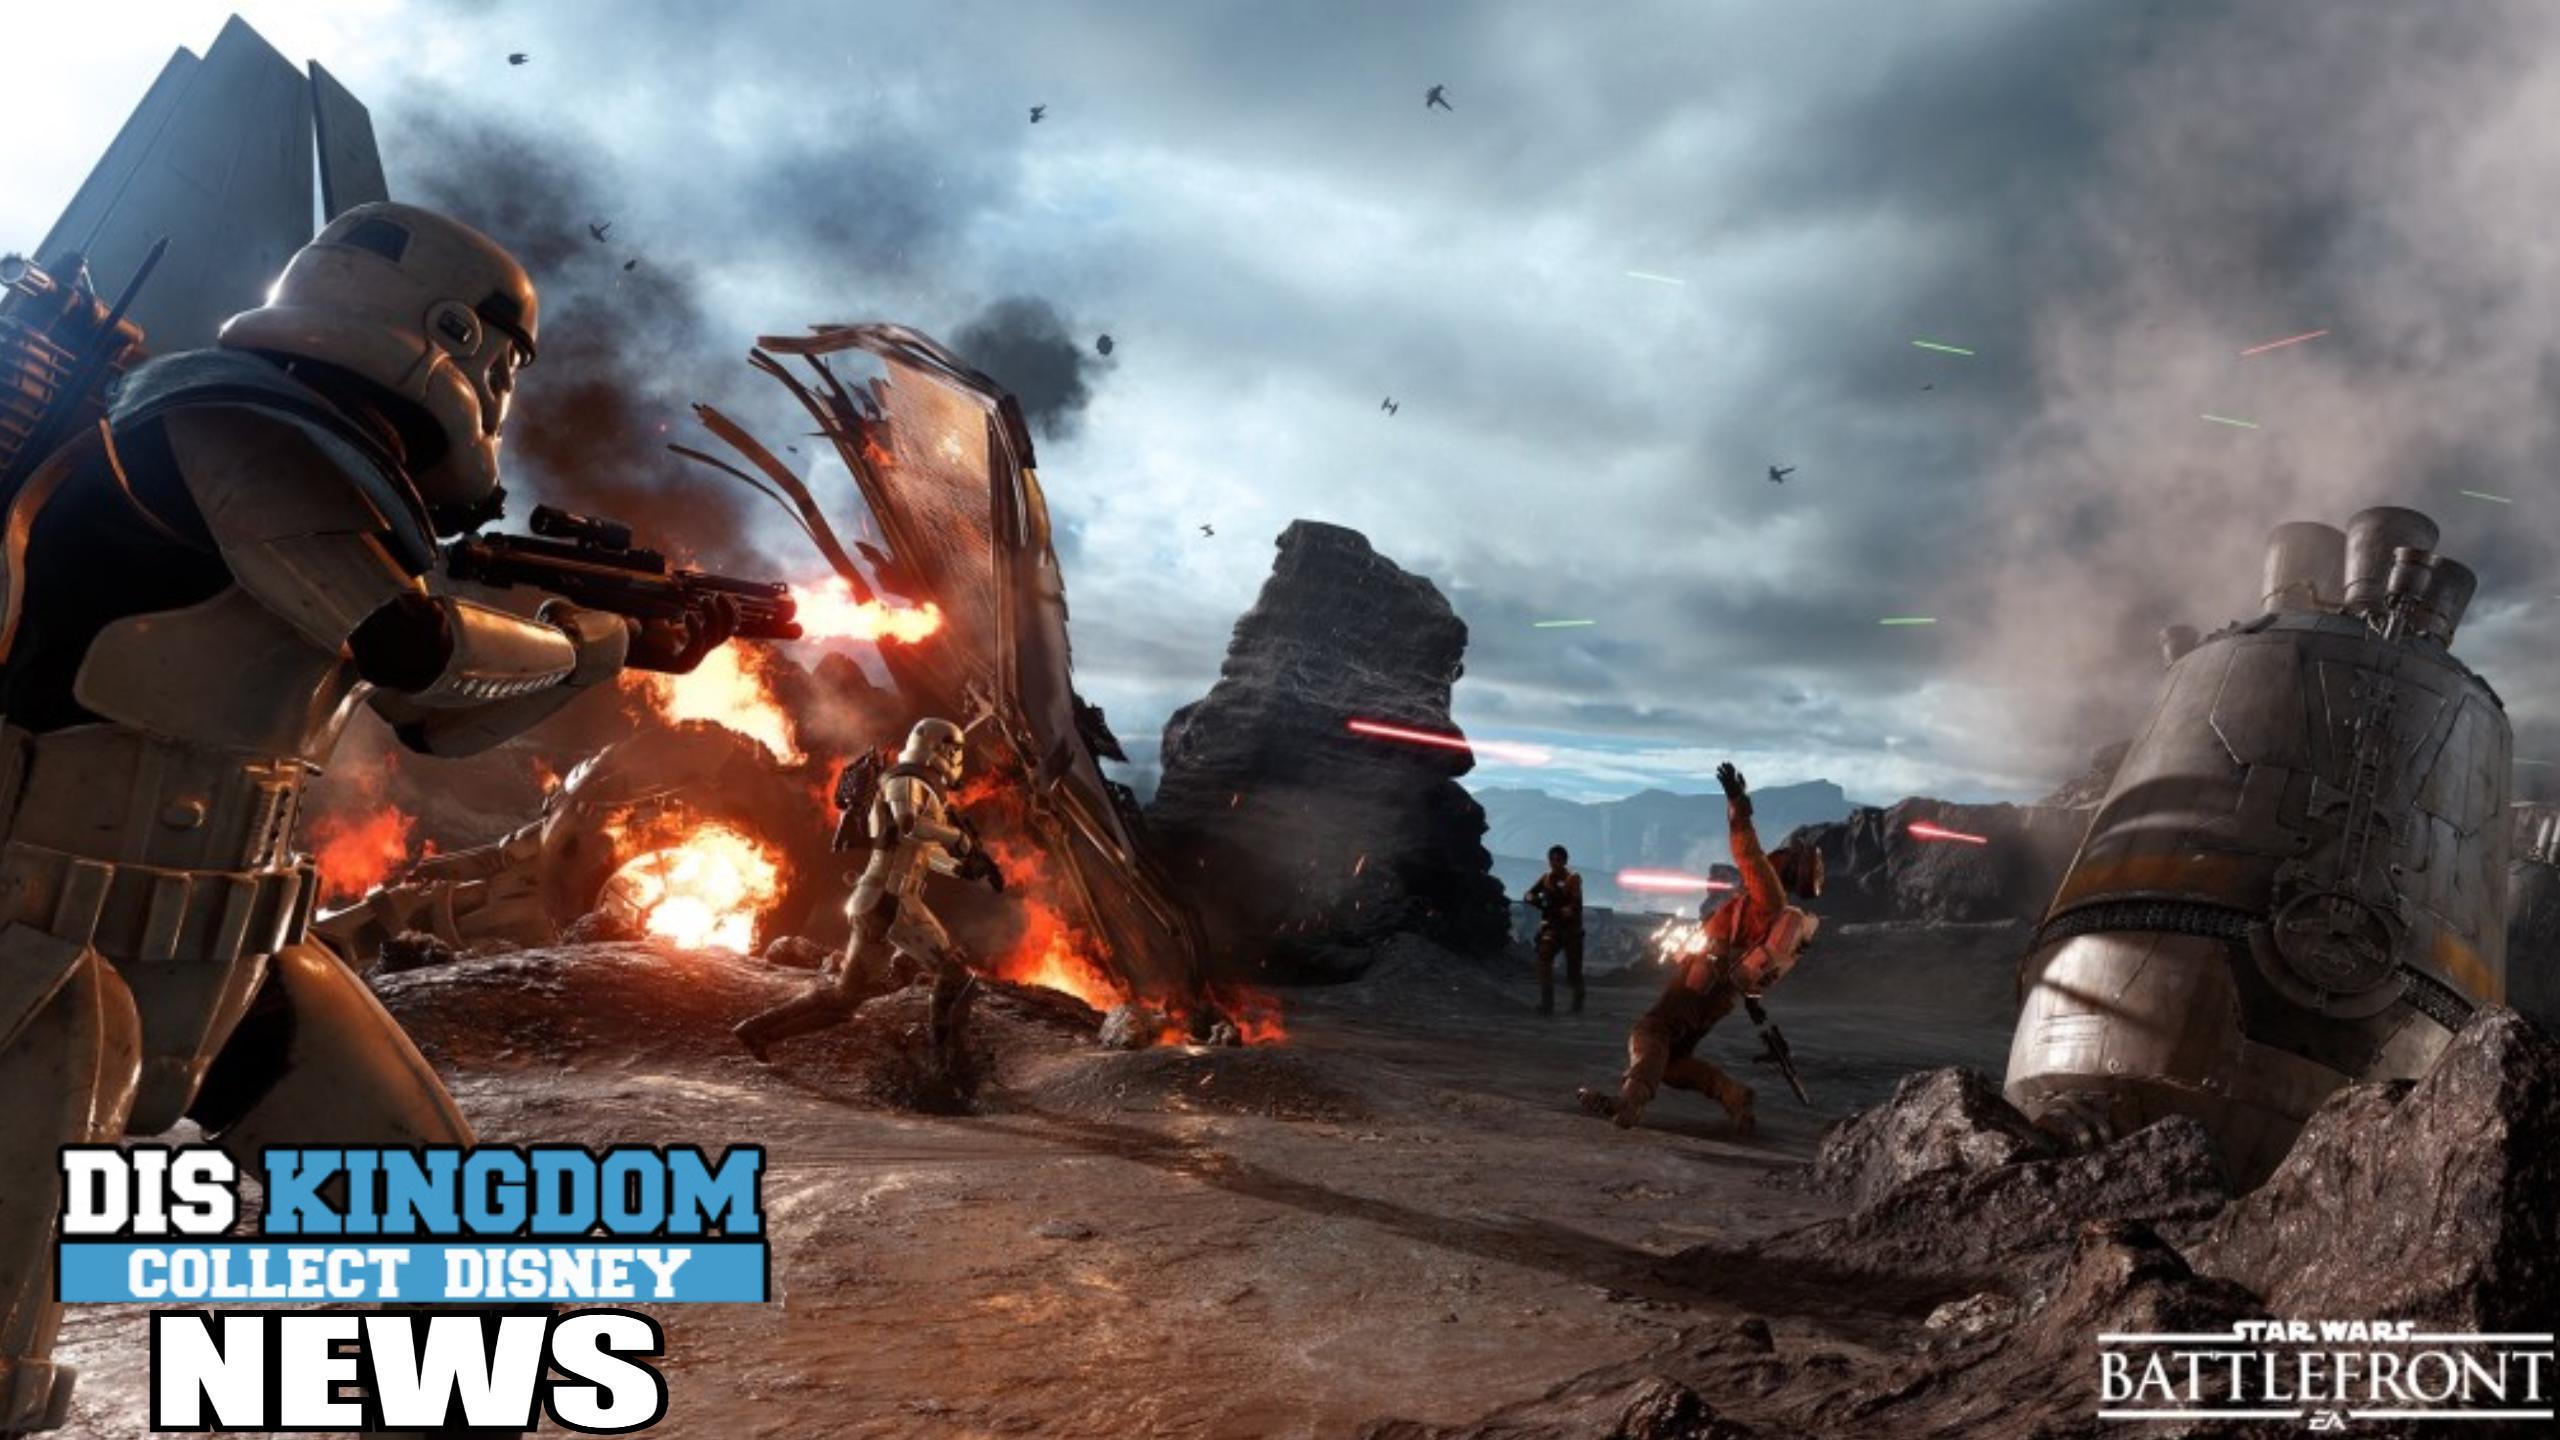 Star Wars Battlefront Beta Coming Soon